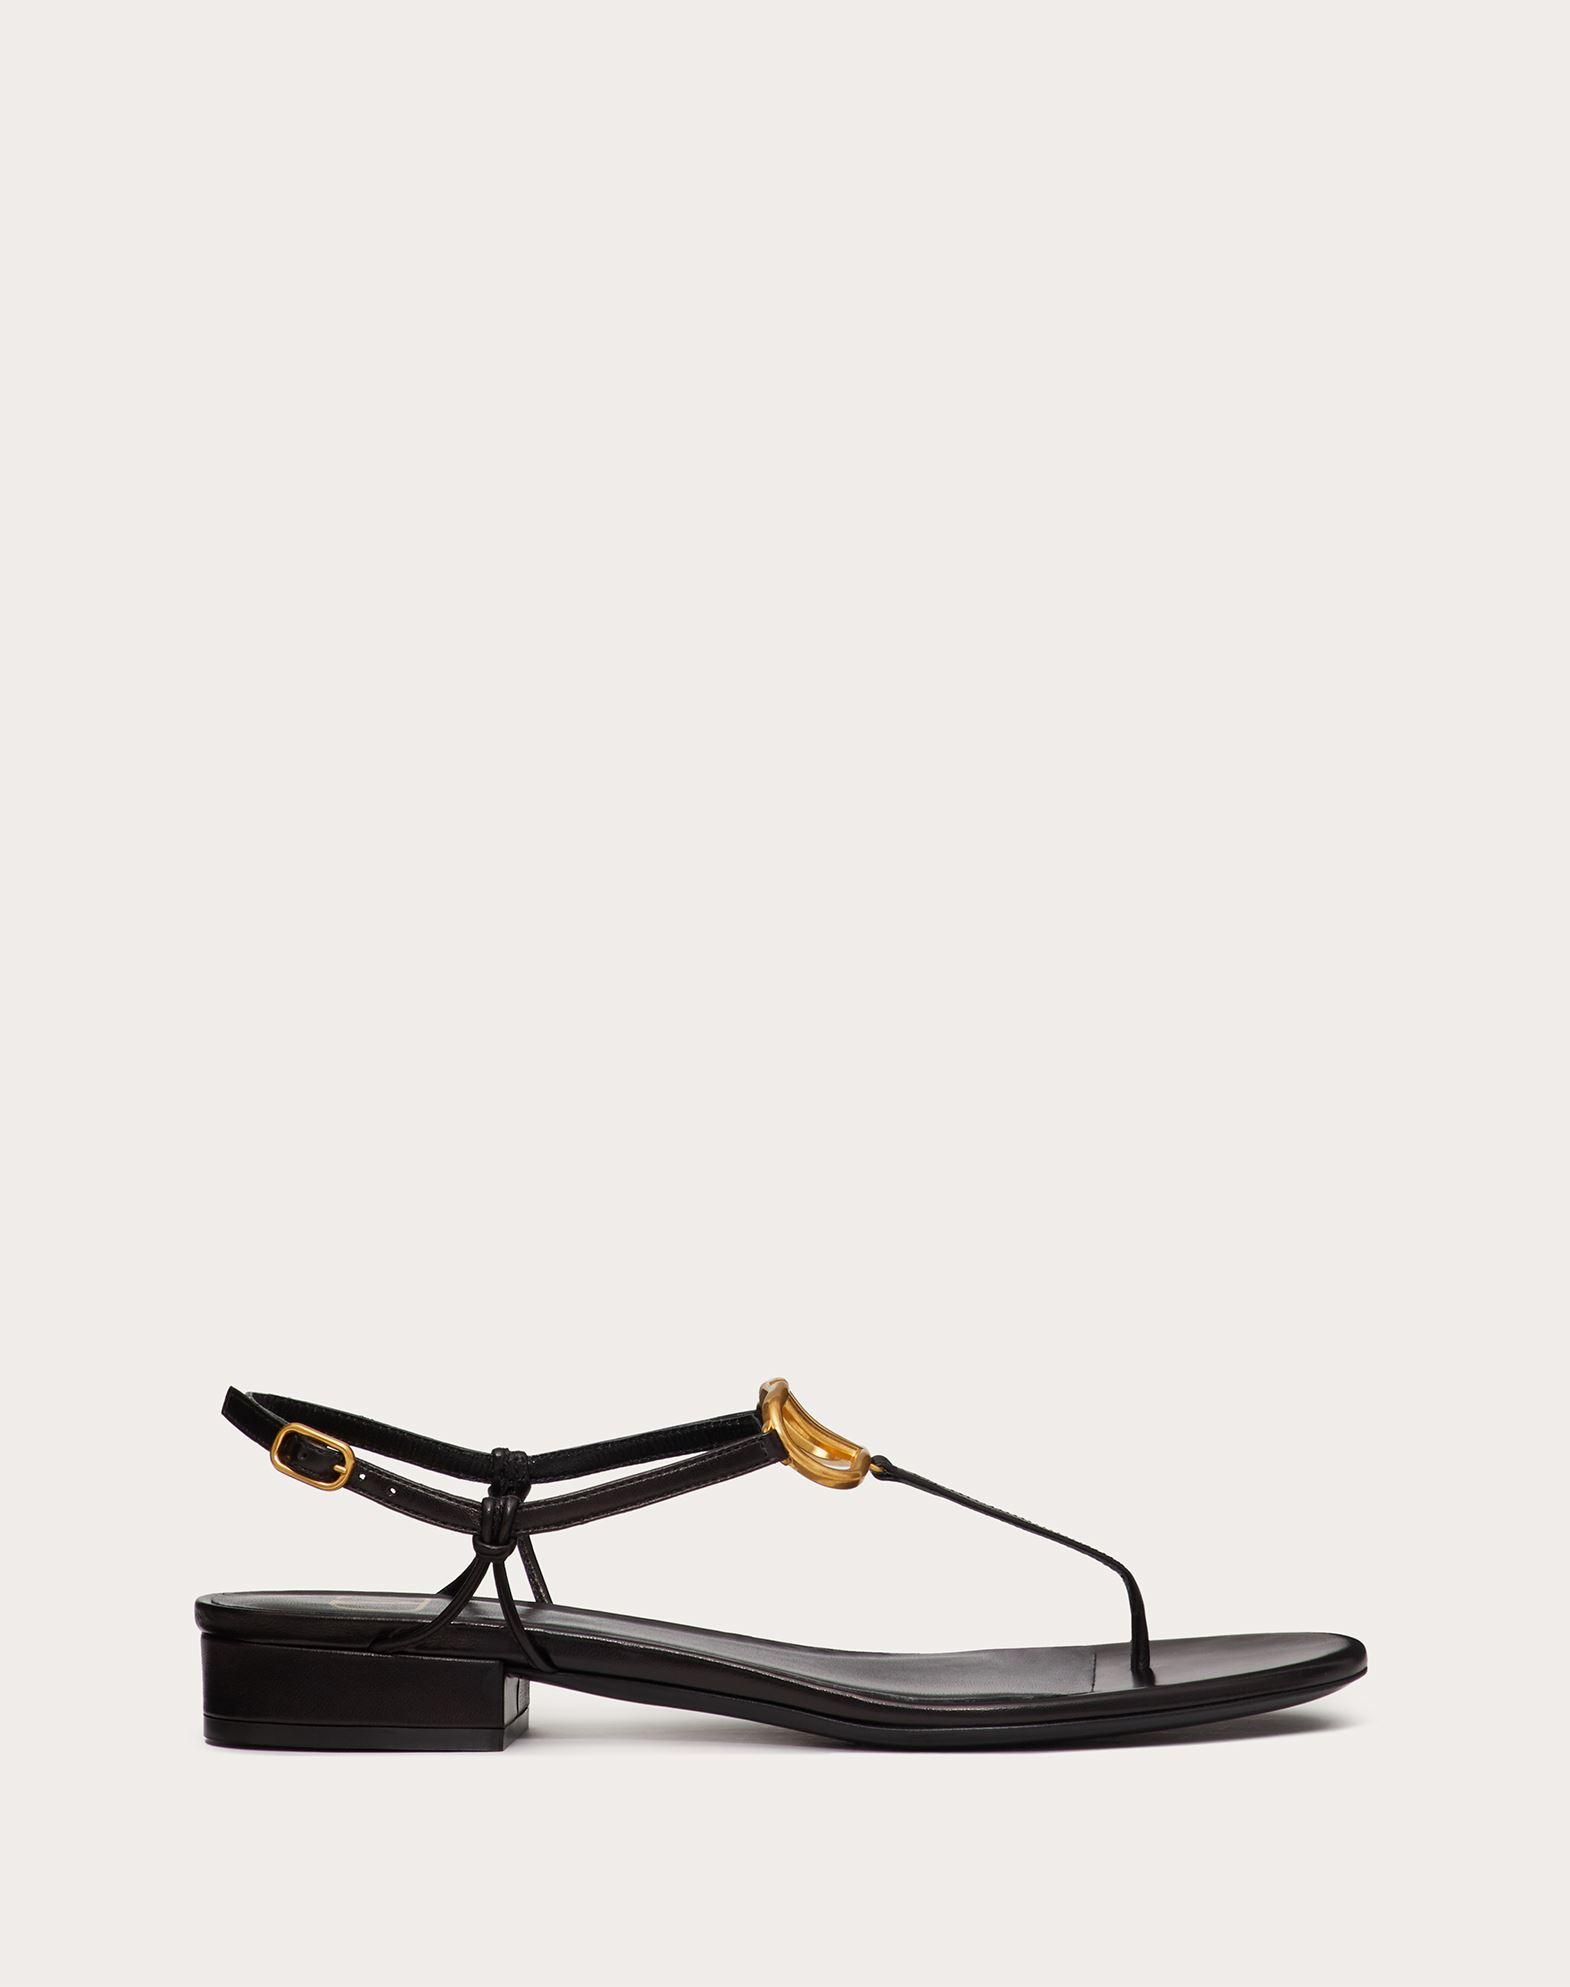 VLOGO Kidskin Sandal 20 mm